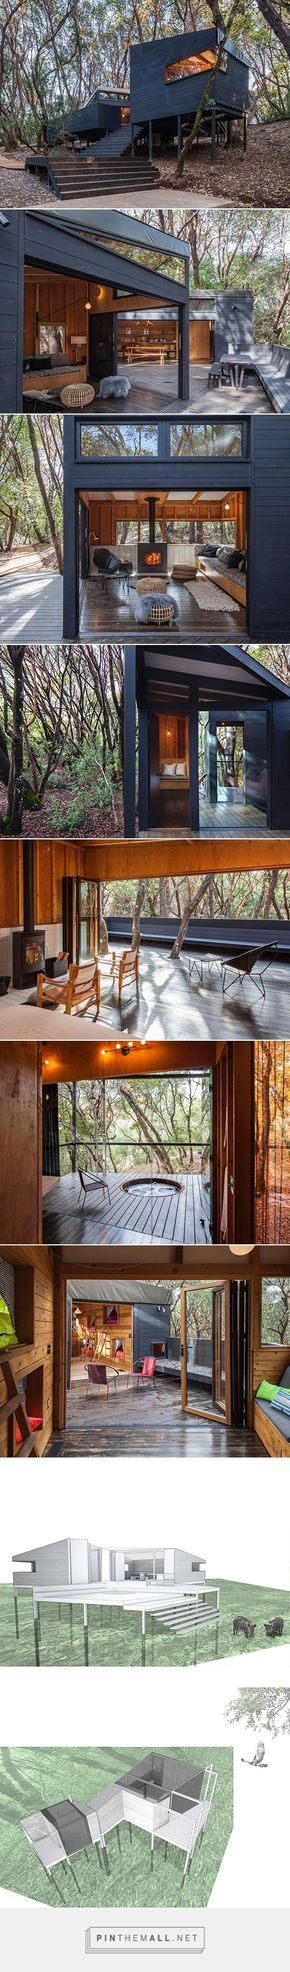 61 mejores imágenes de arq en Pinterest | Casas de madera ...